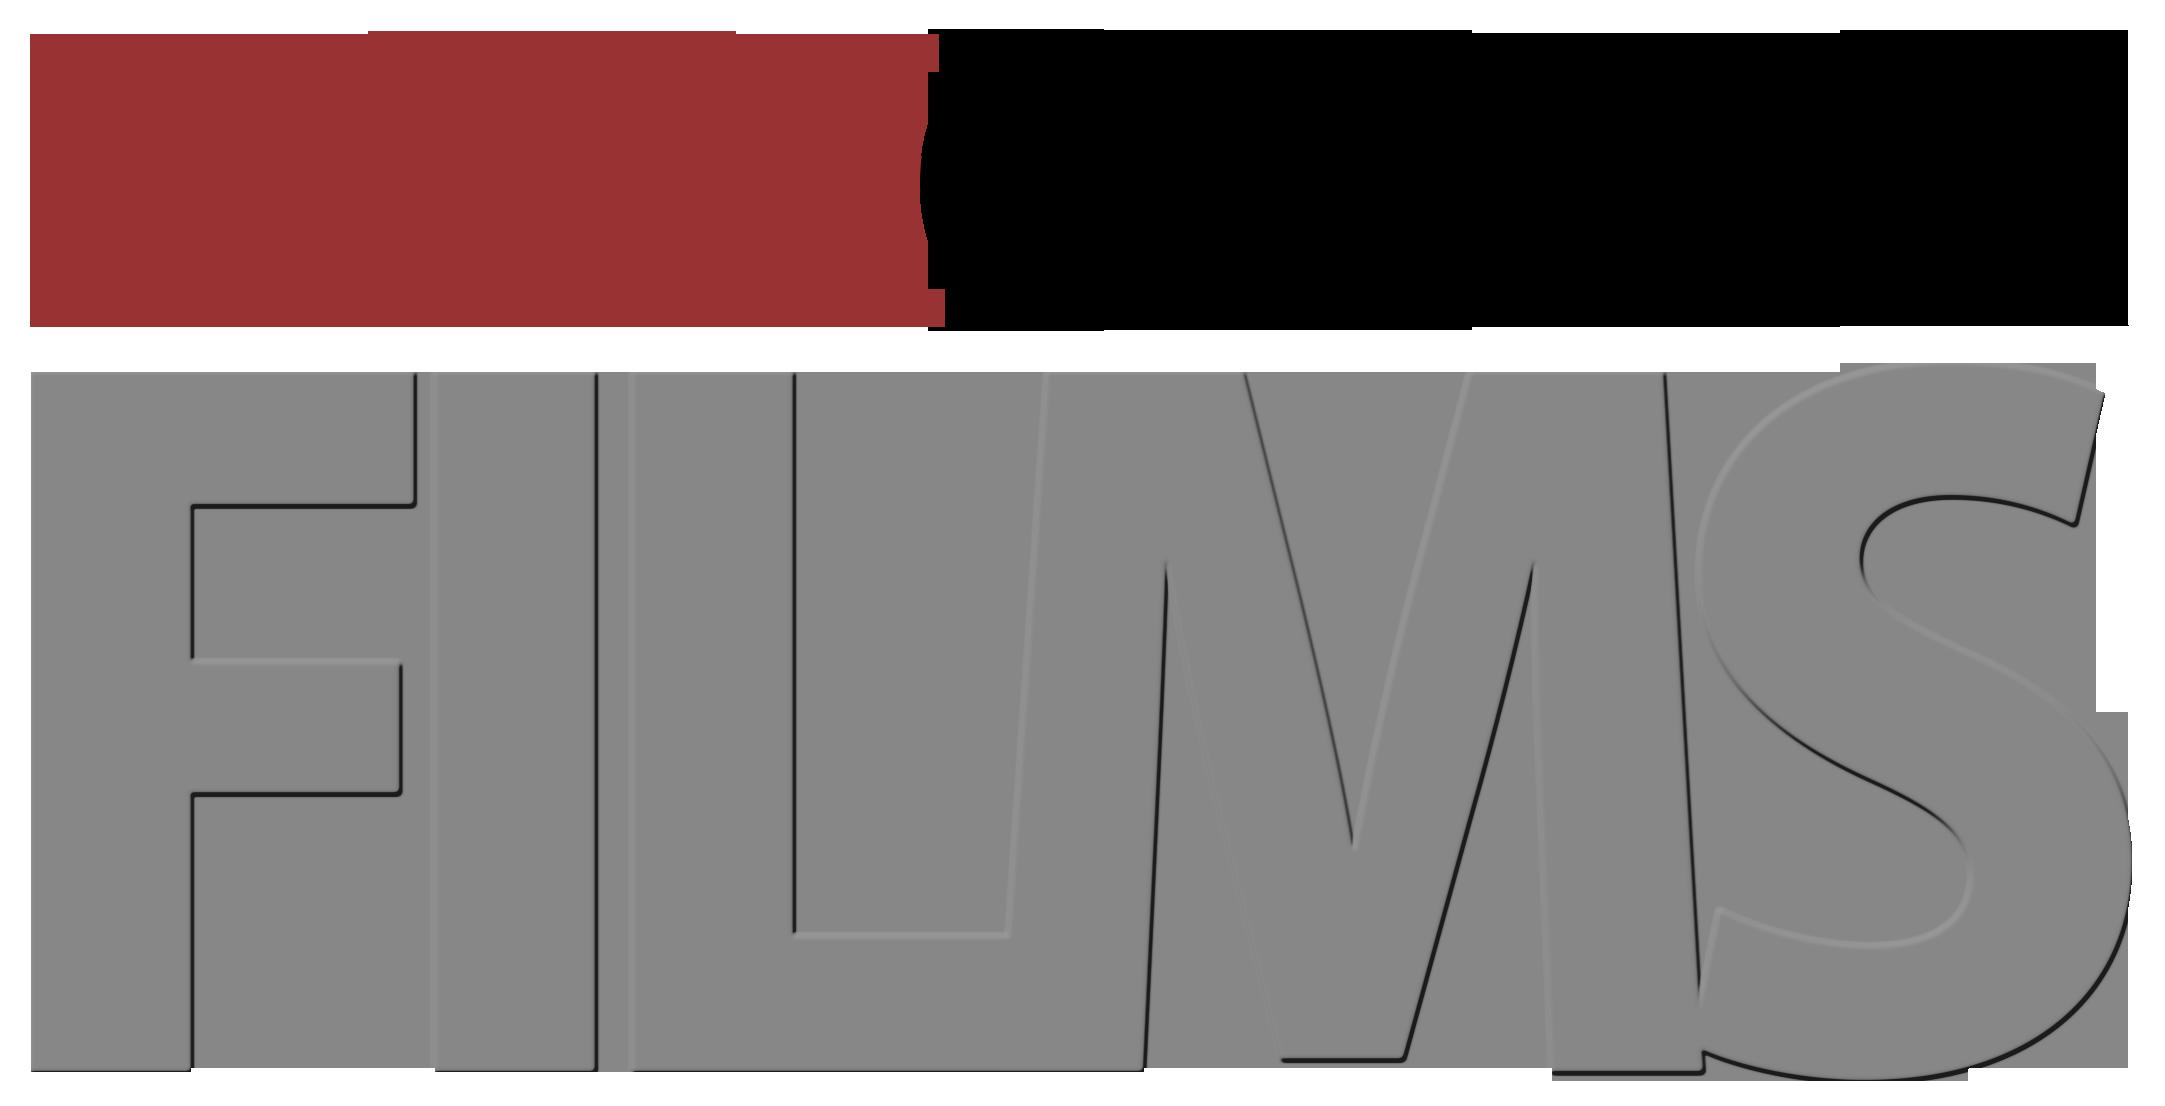 Entrecruzar Films